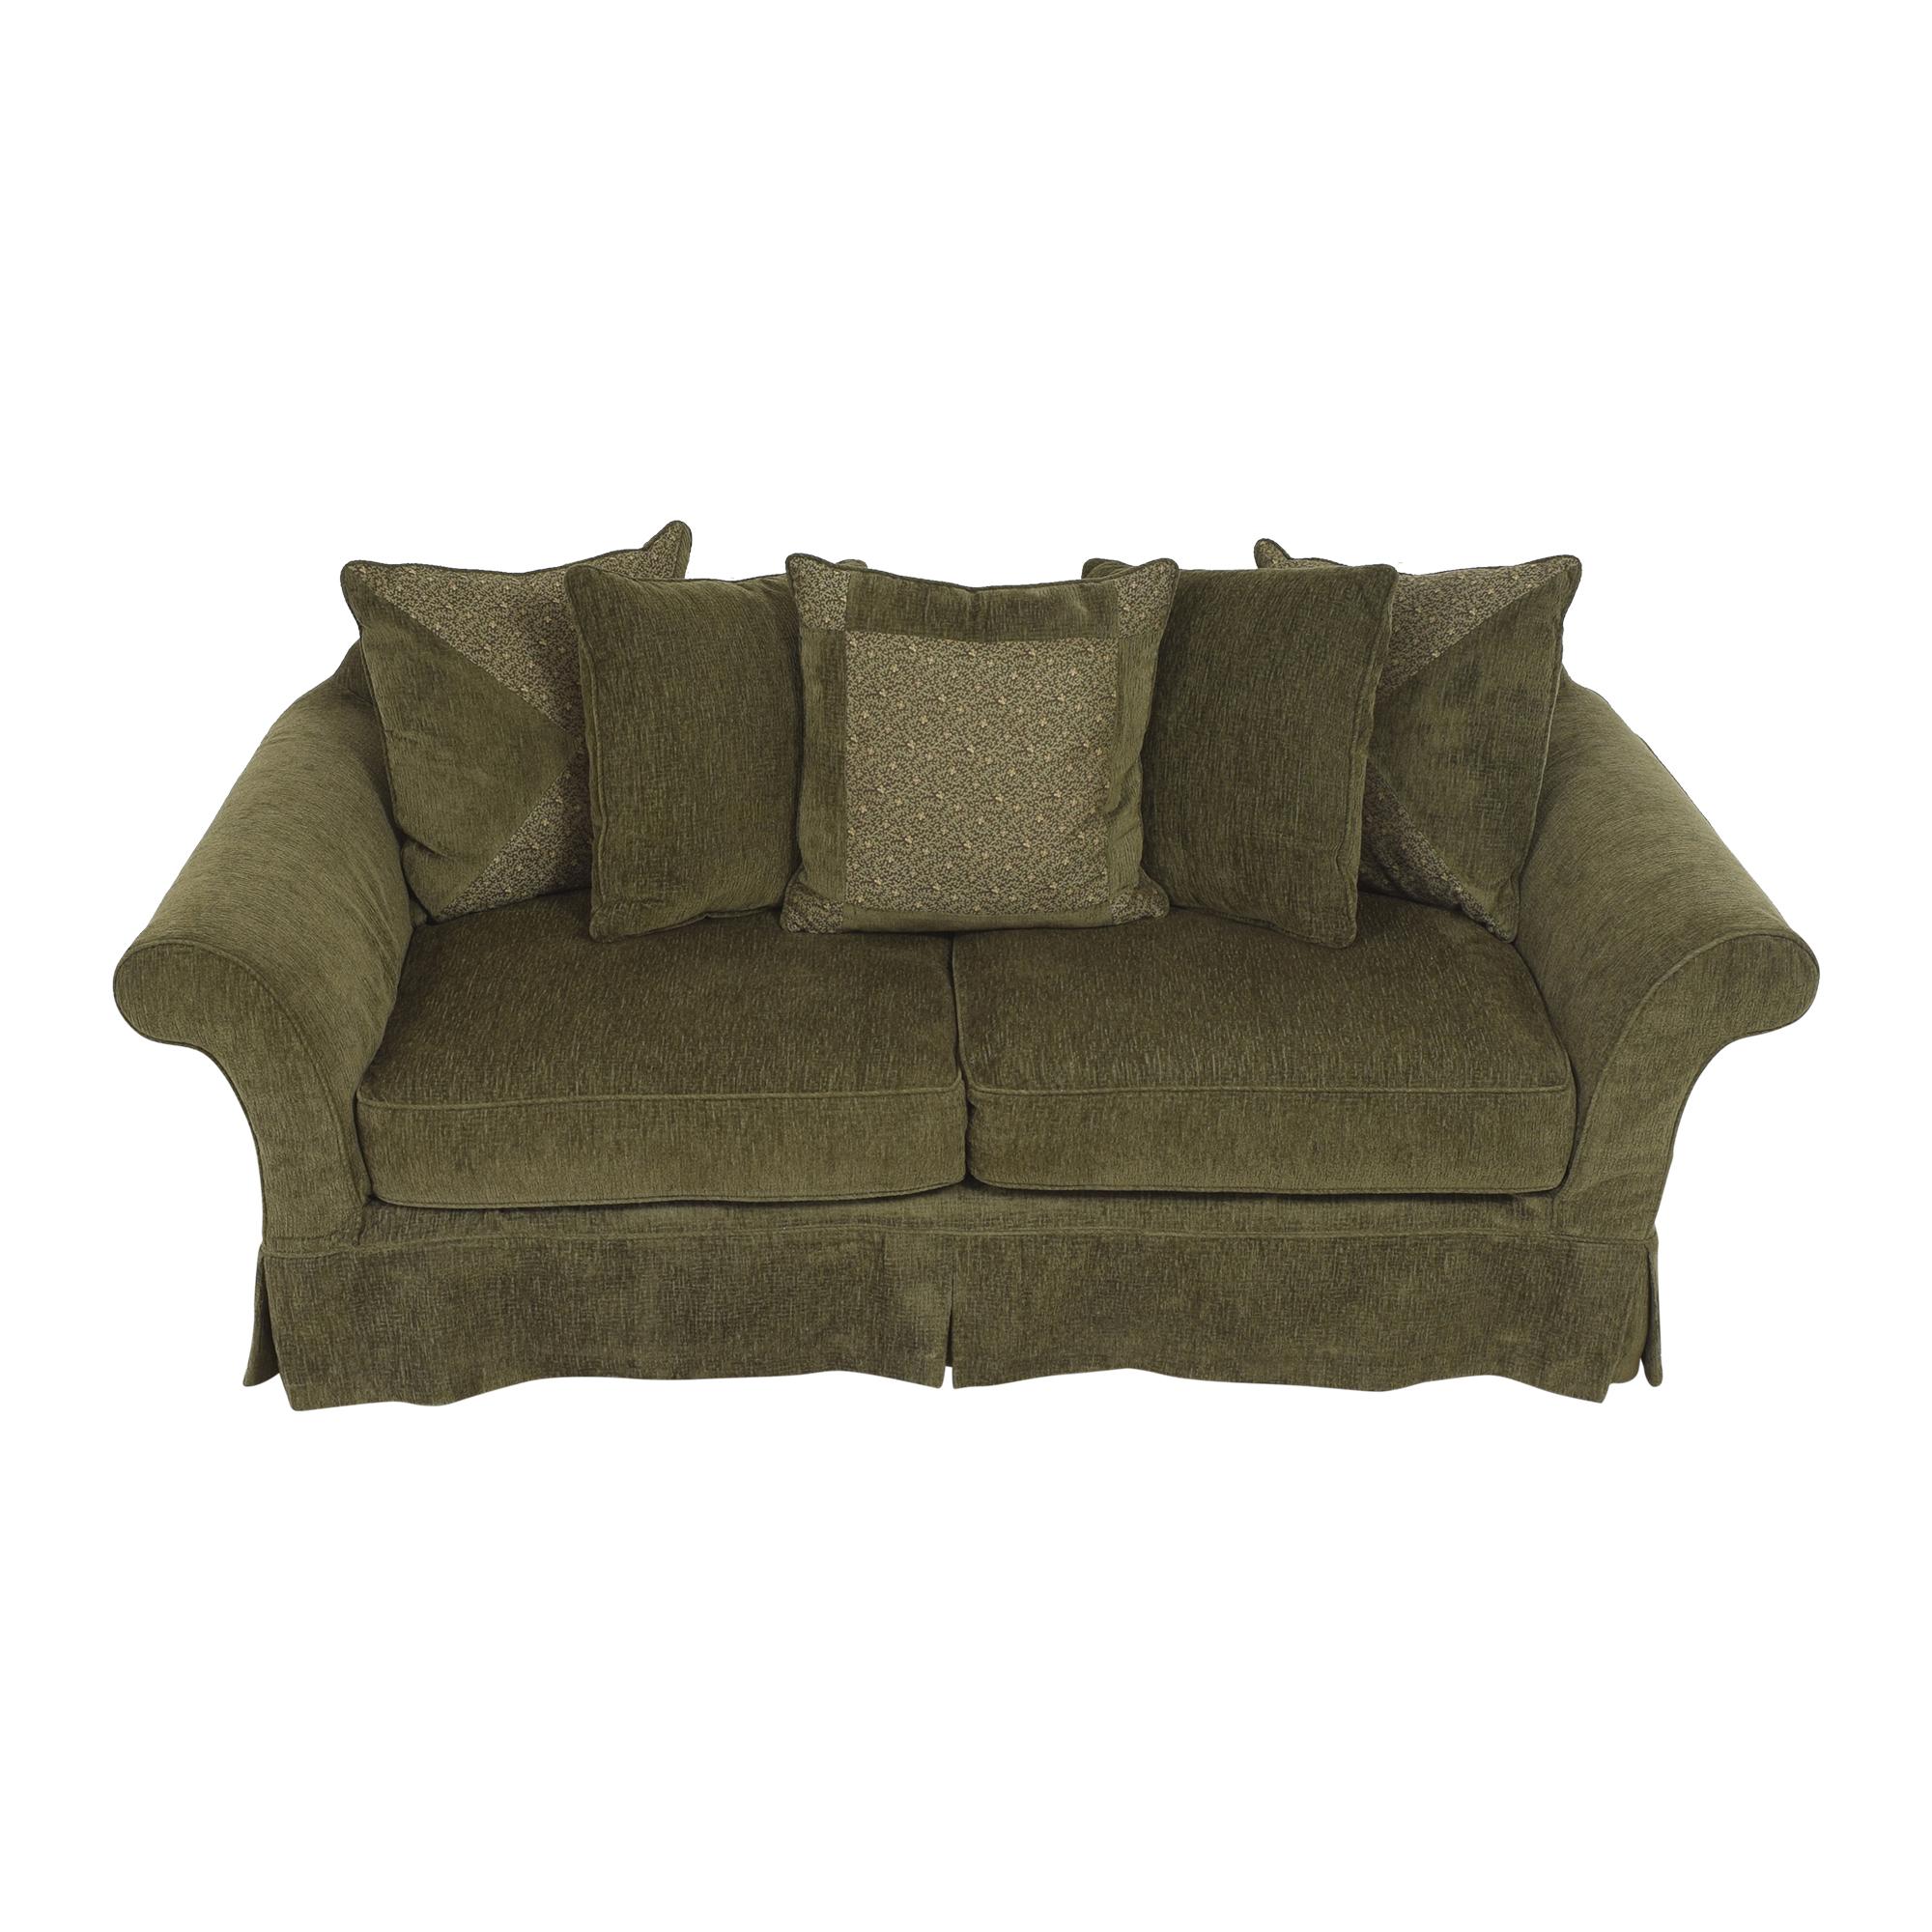 Flared Arm Skirted Sofa used